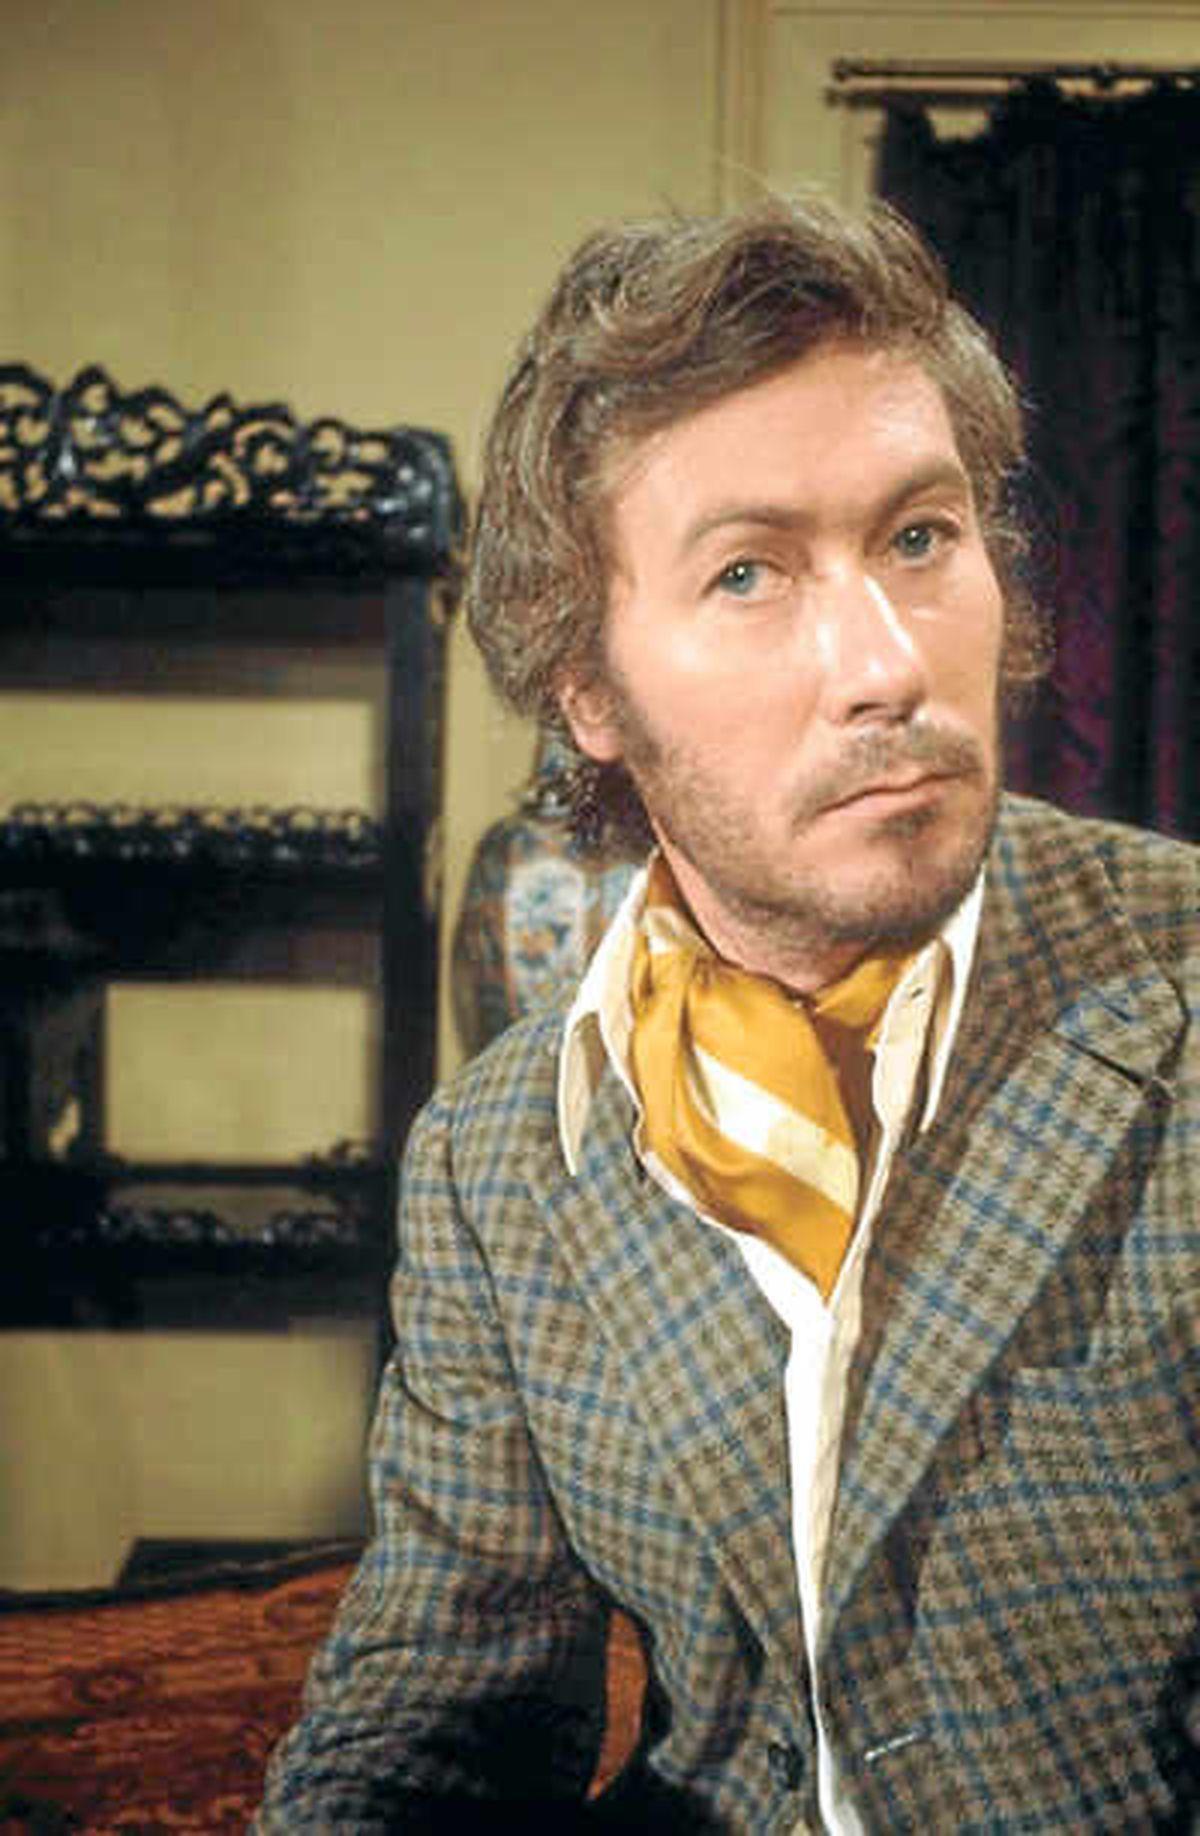 John Osborne, the great Shropshire playwright